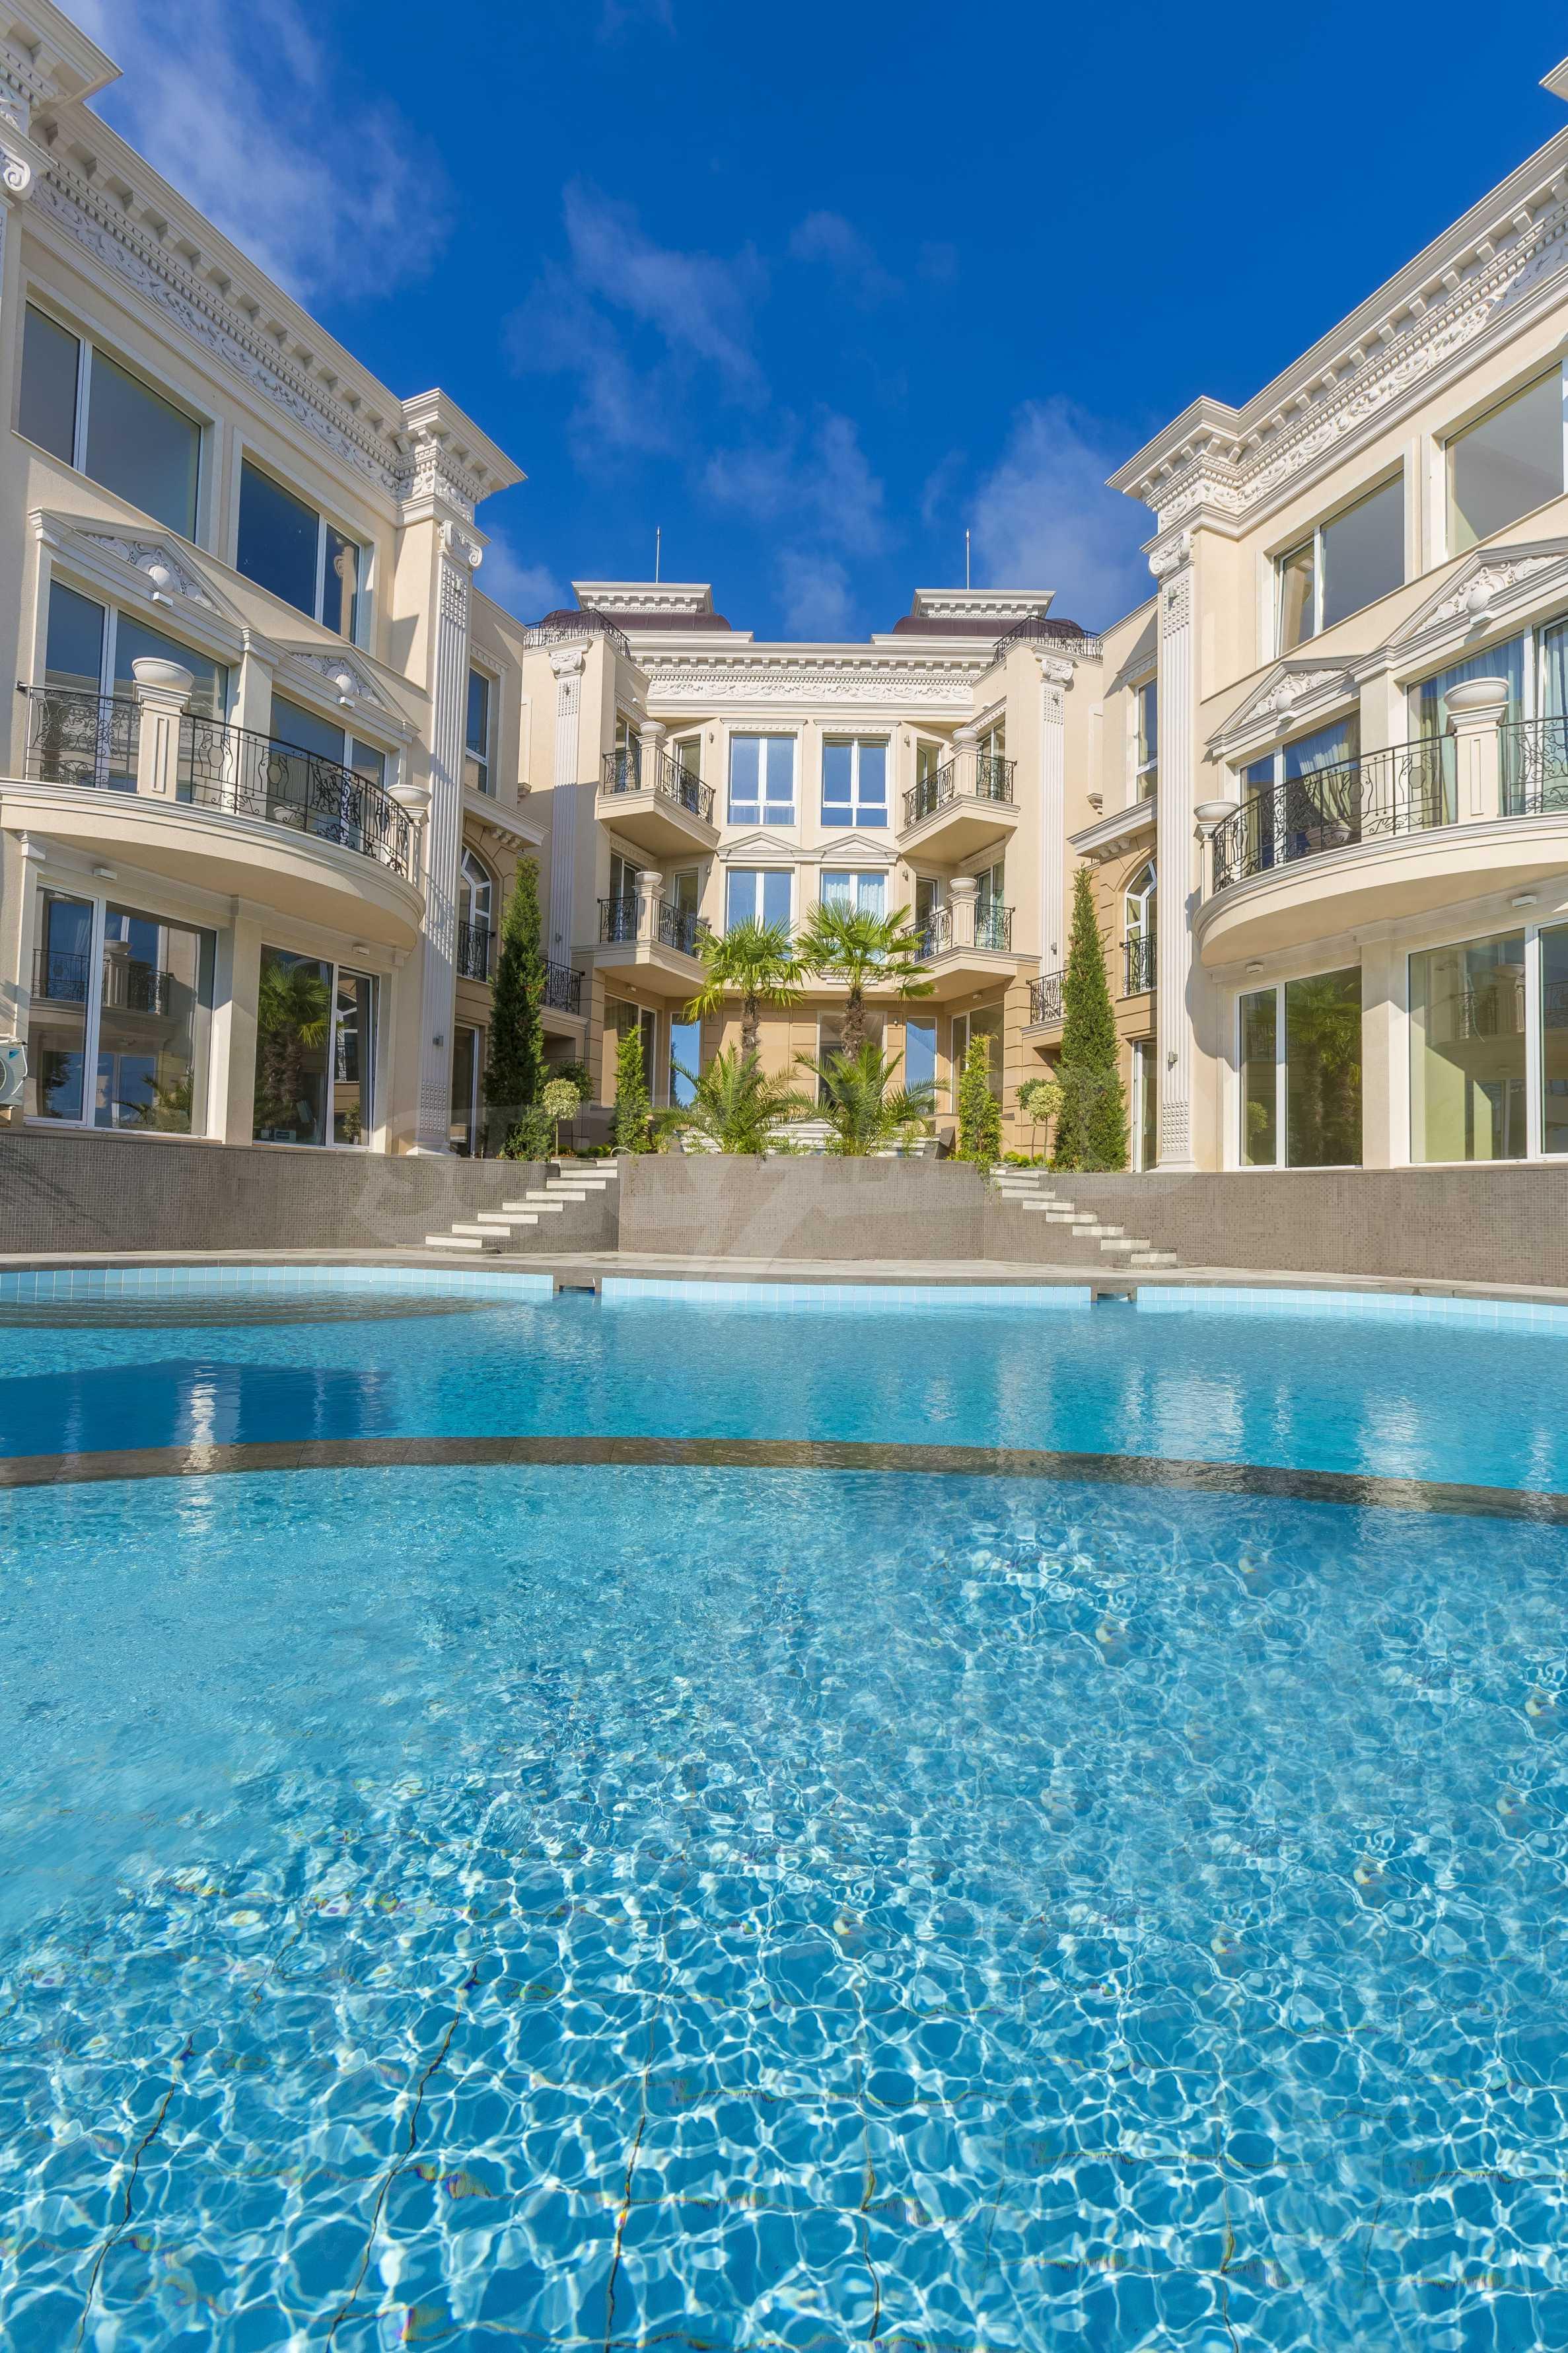 Дизайнерски тристаен апартамент под наем за летен сезон в резиденция Belle Époque в Лозенец 38